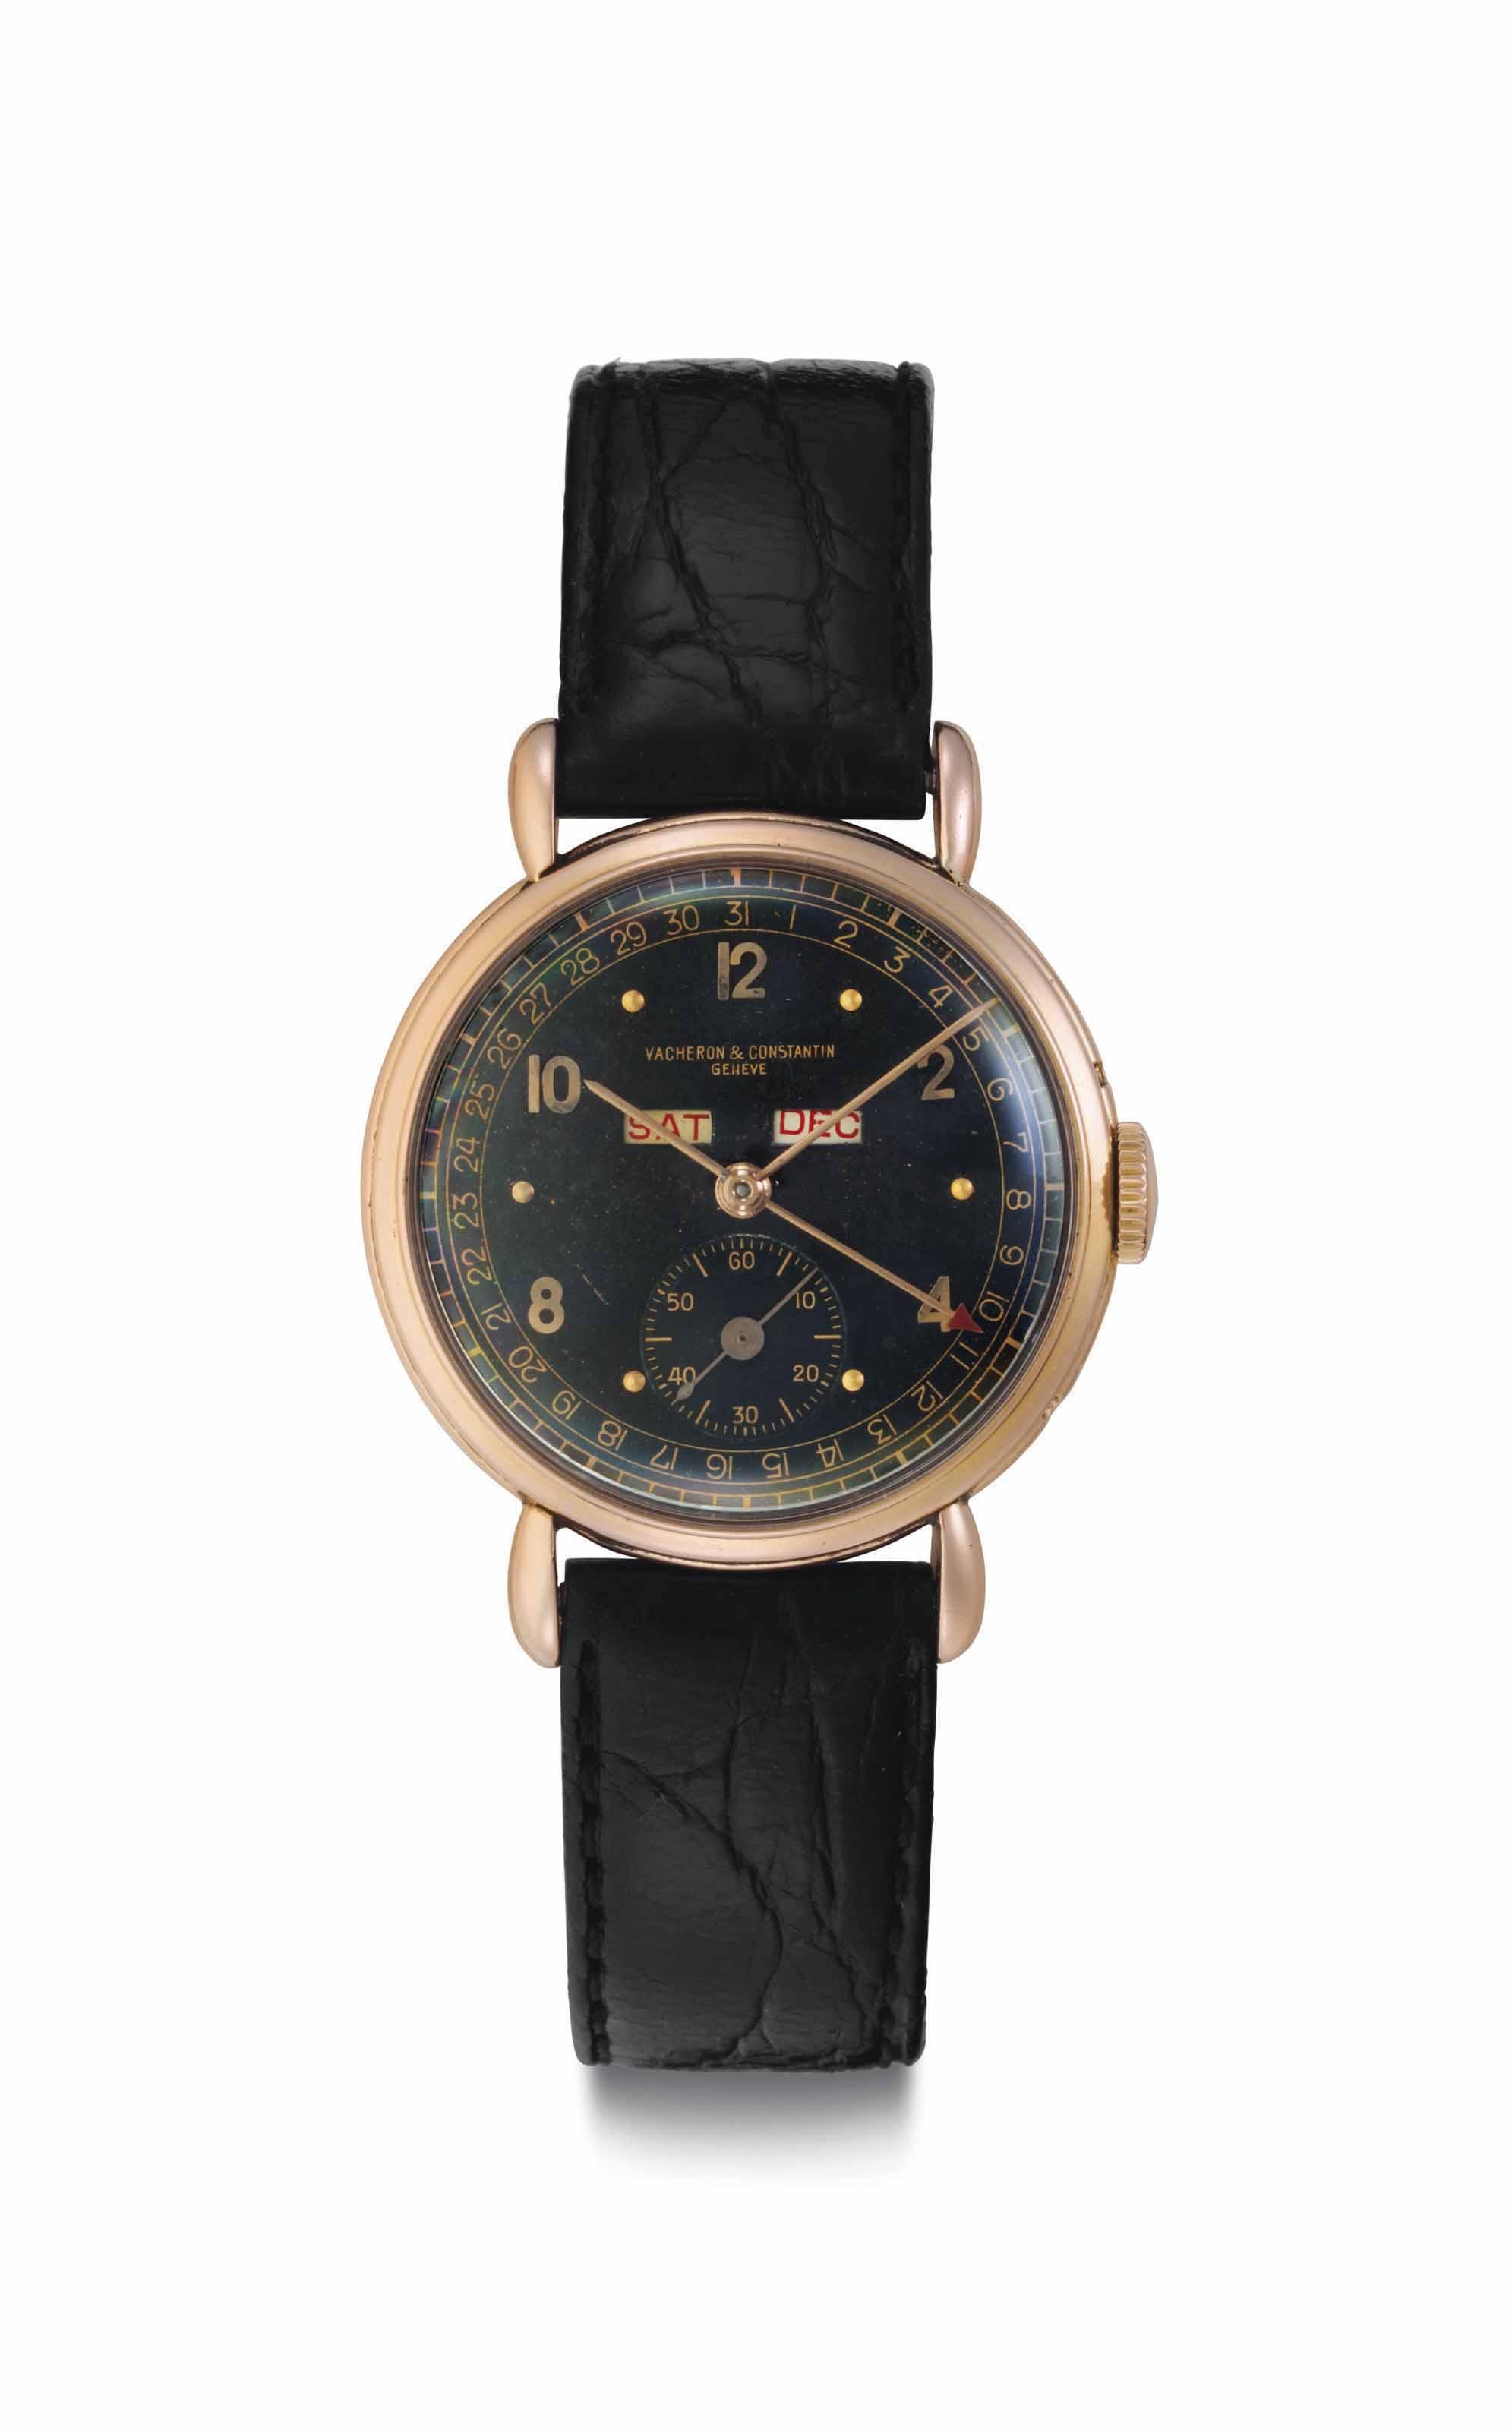 Vacheron Constantin. A Fine and Rare 18k Pink Gold Triple Calendar Wristwatch with Black Dial